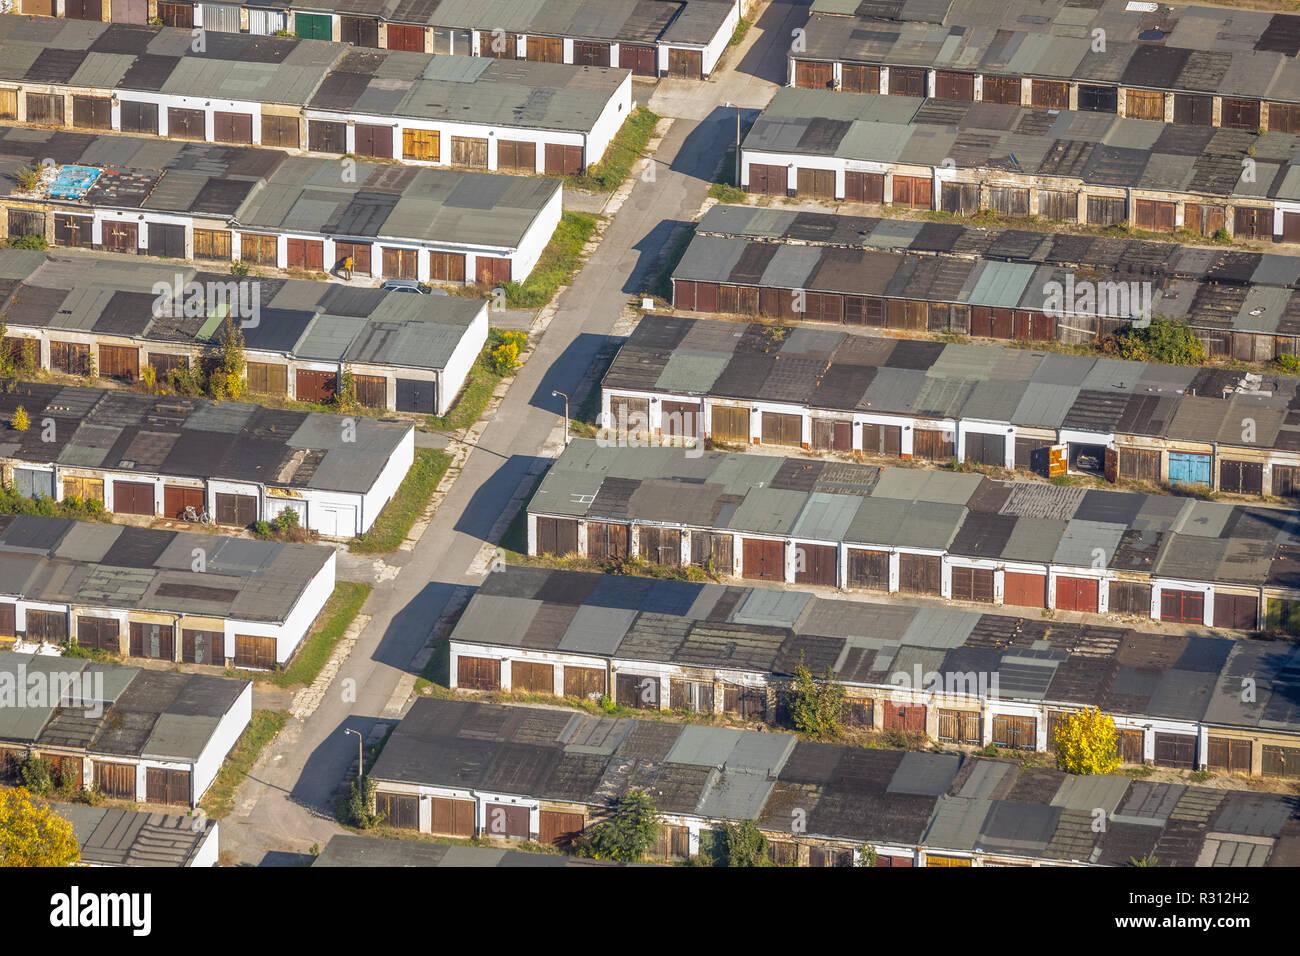 Aerial view, garage park Aschersleben, Valentina-Tereshkova street, Paderborn, Saxony-Anhalt, Germany, Europe ,, Aschersleben, Paderborn, DEU, Europe, - Stock Image